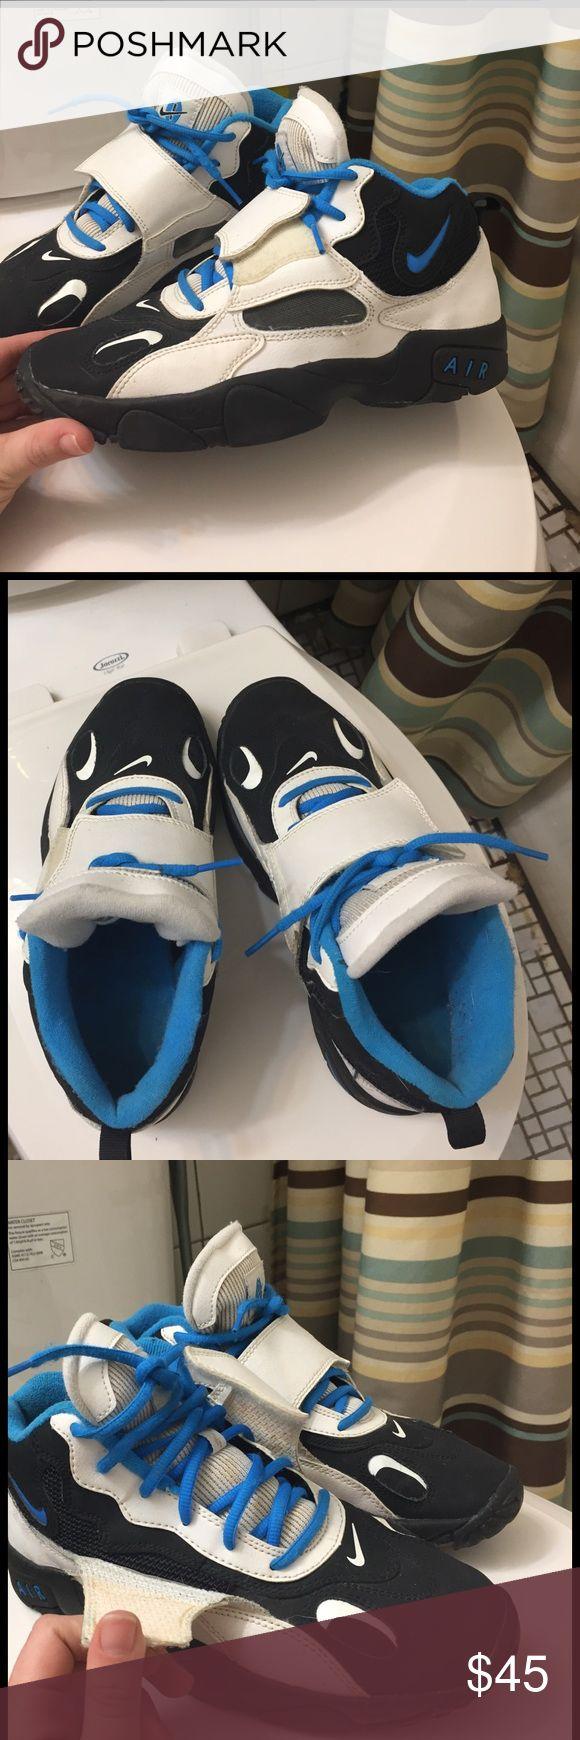 Nike Turfs. BLACK WHITE & BLUE (Velcro) Used. Still look new. No box. Nike Shoes Athletic Shoes